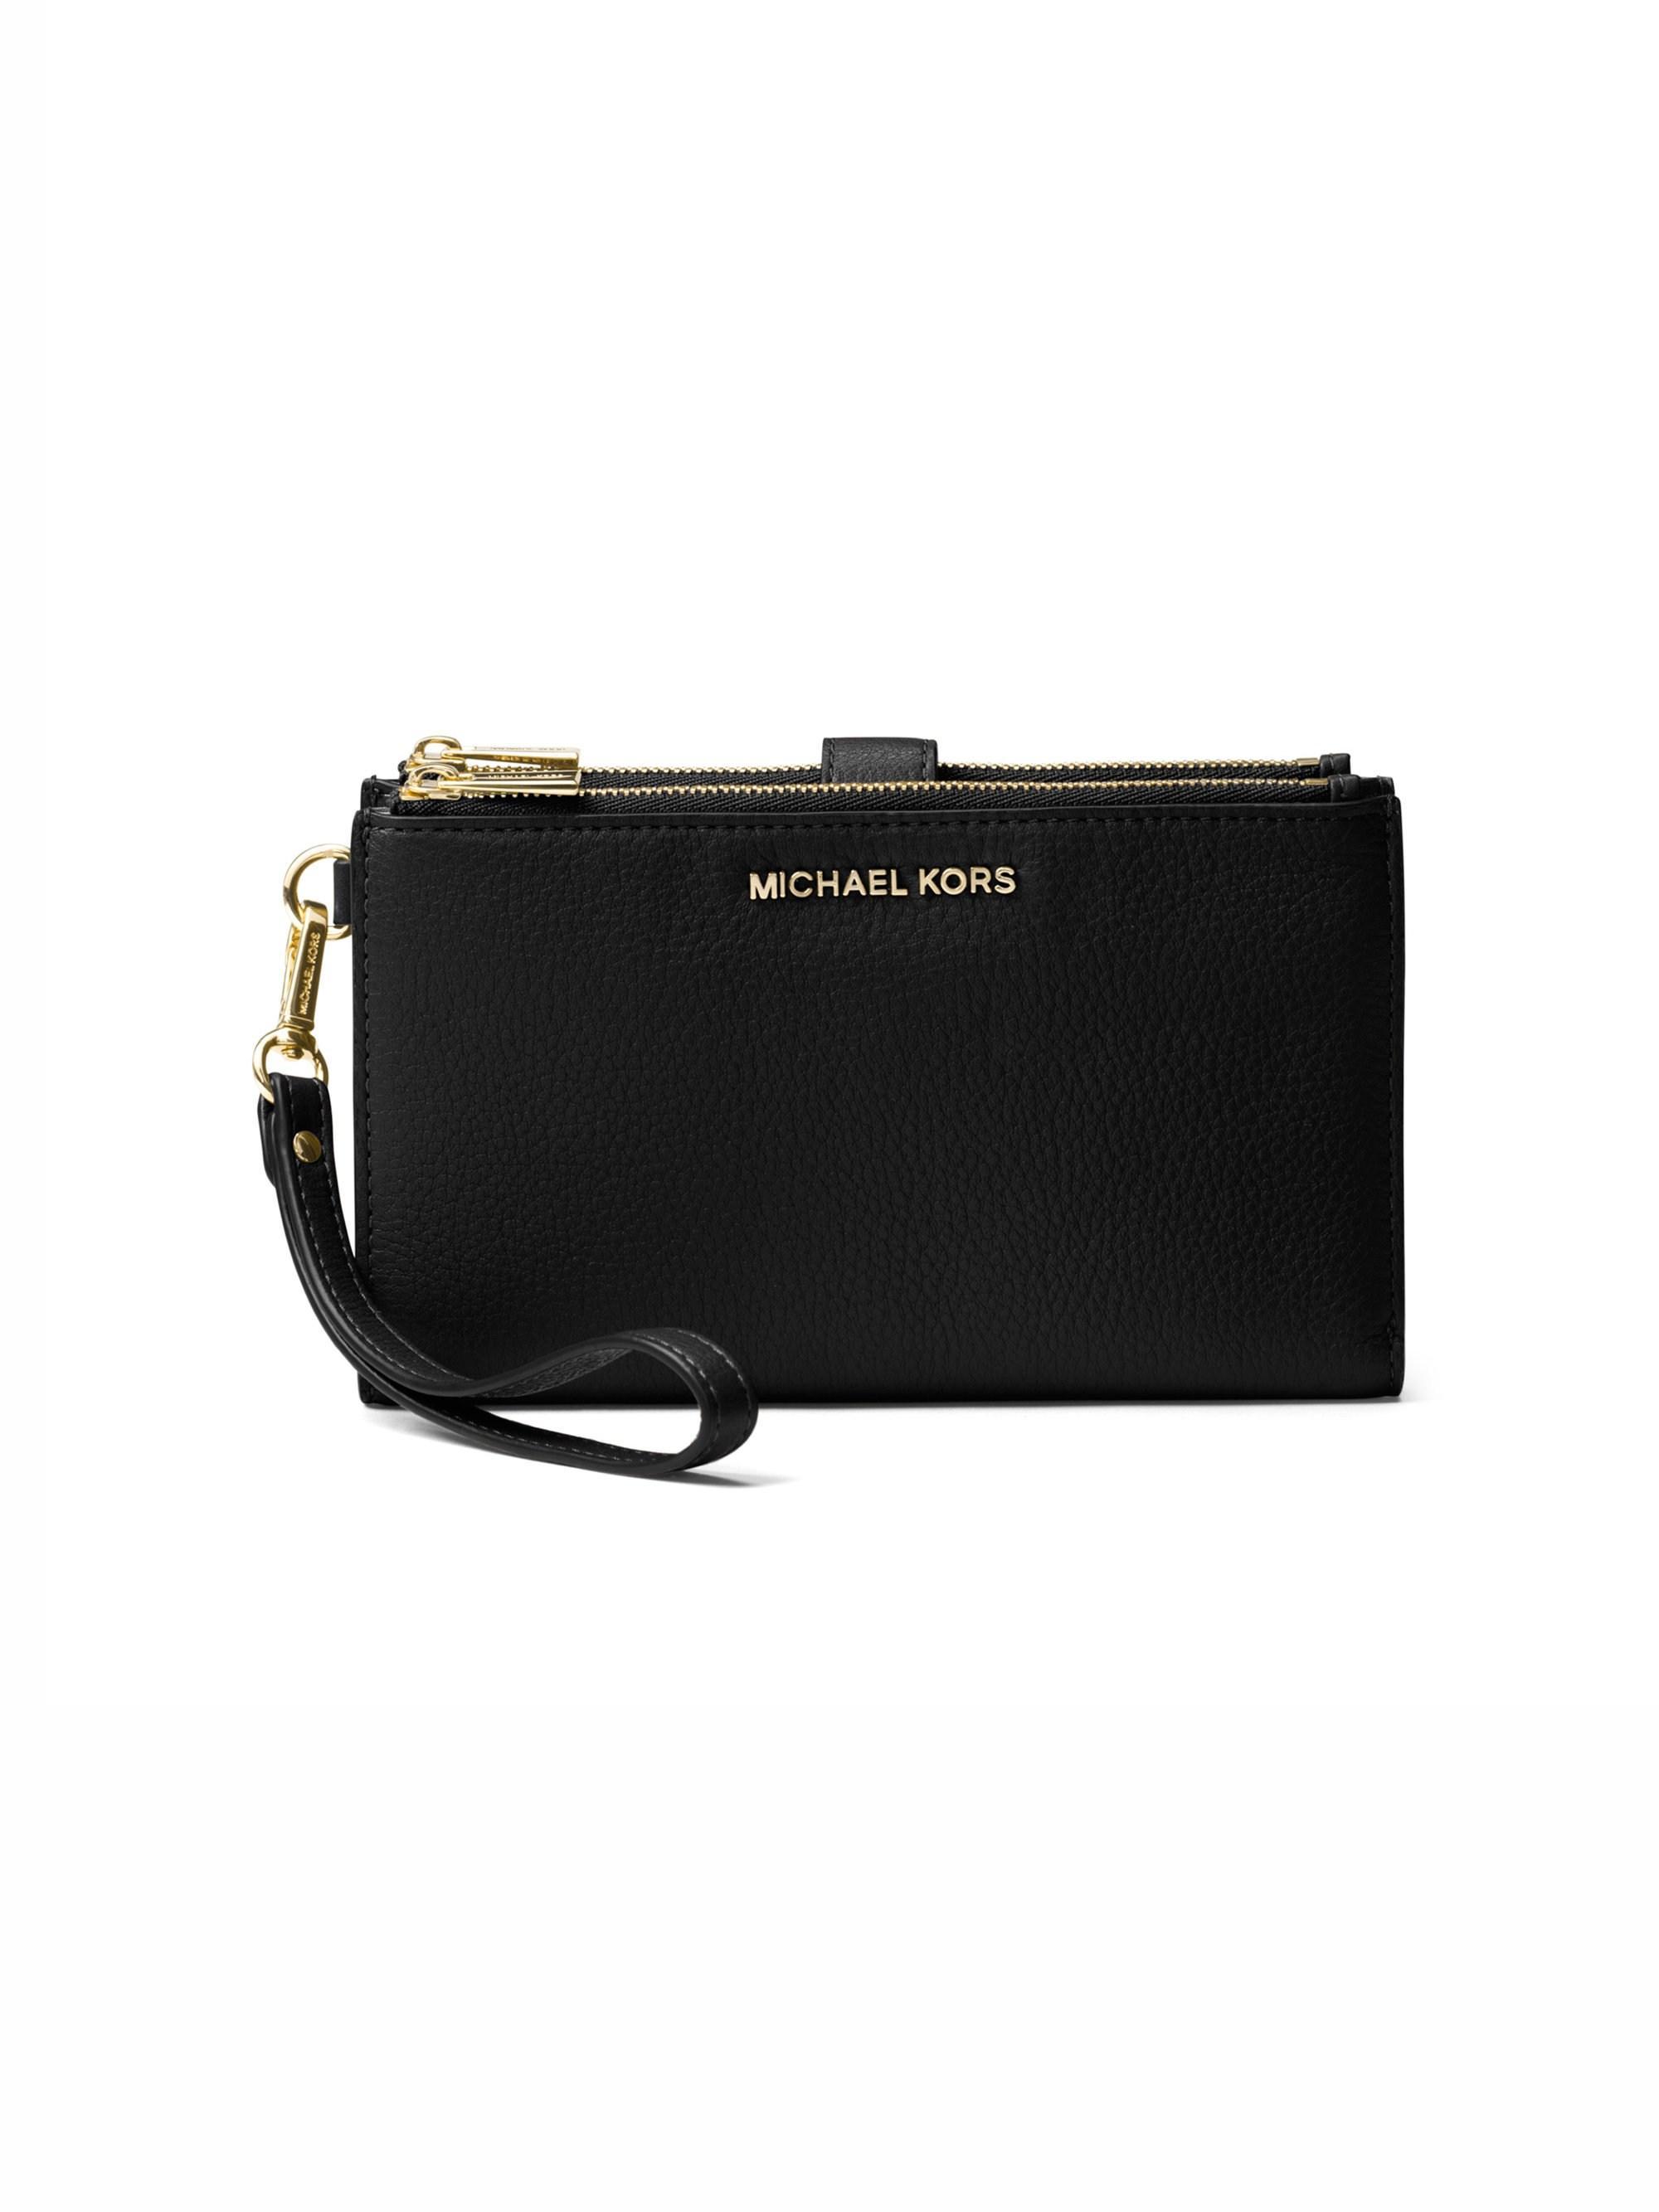 4c77ec5bae85 Lyst - MICHAEL Michael Kors Women s Double Zip Leather Wristlet ...